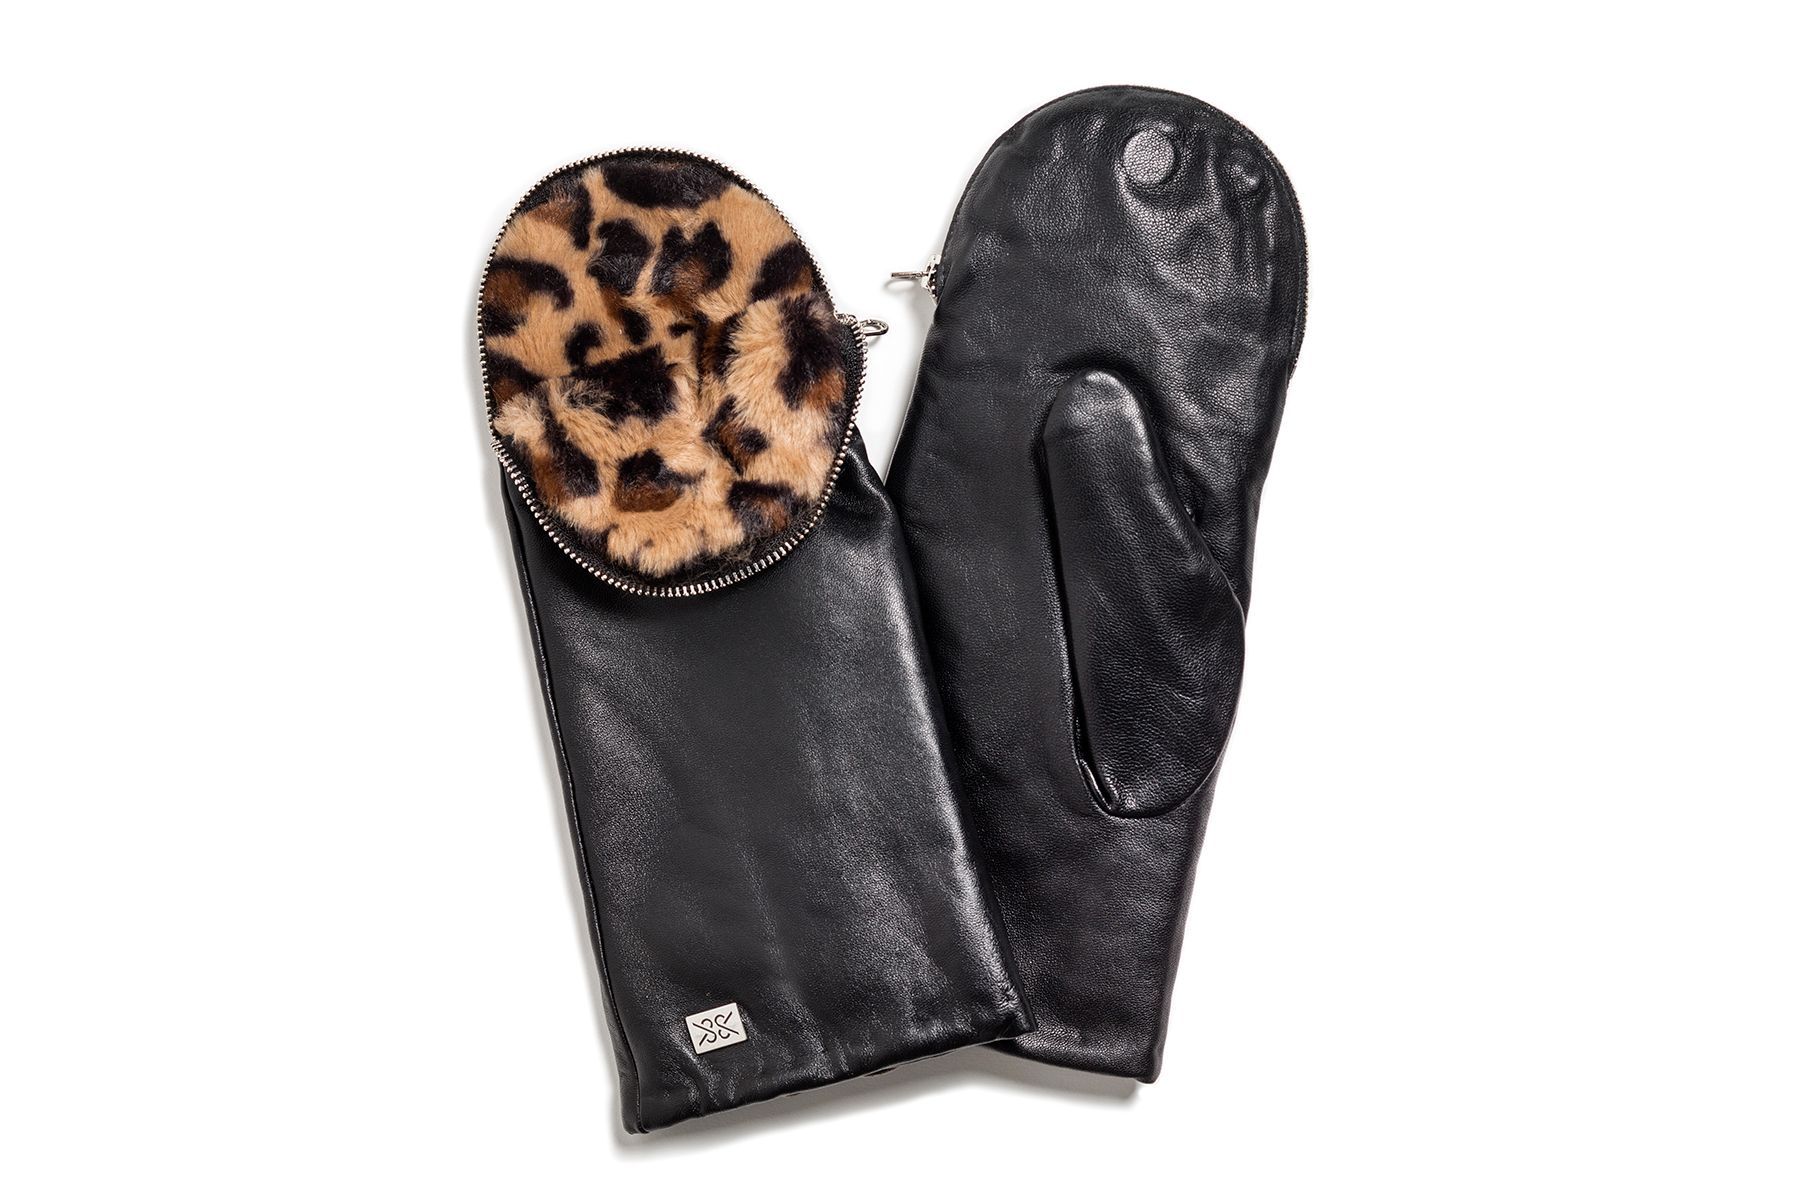 MSP_QueenAnna_Gloves.jpg